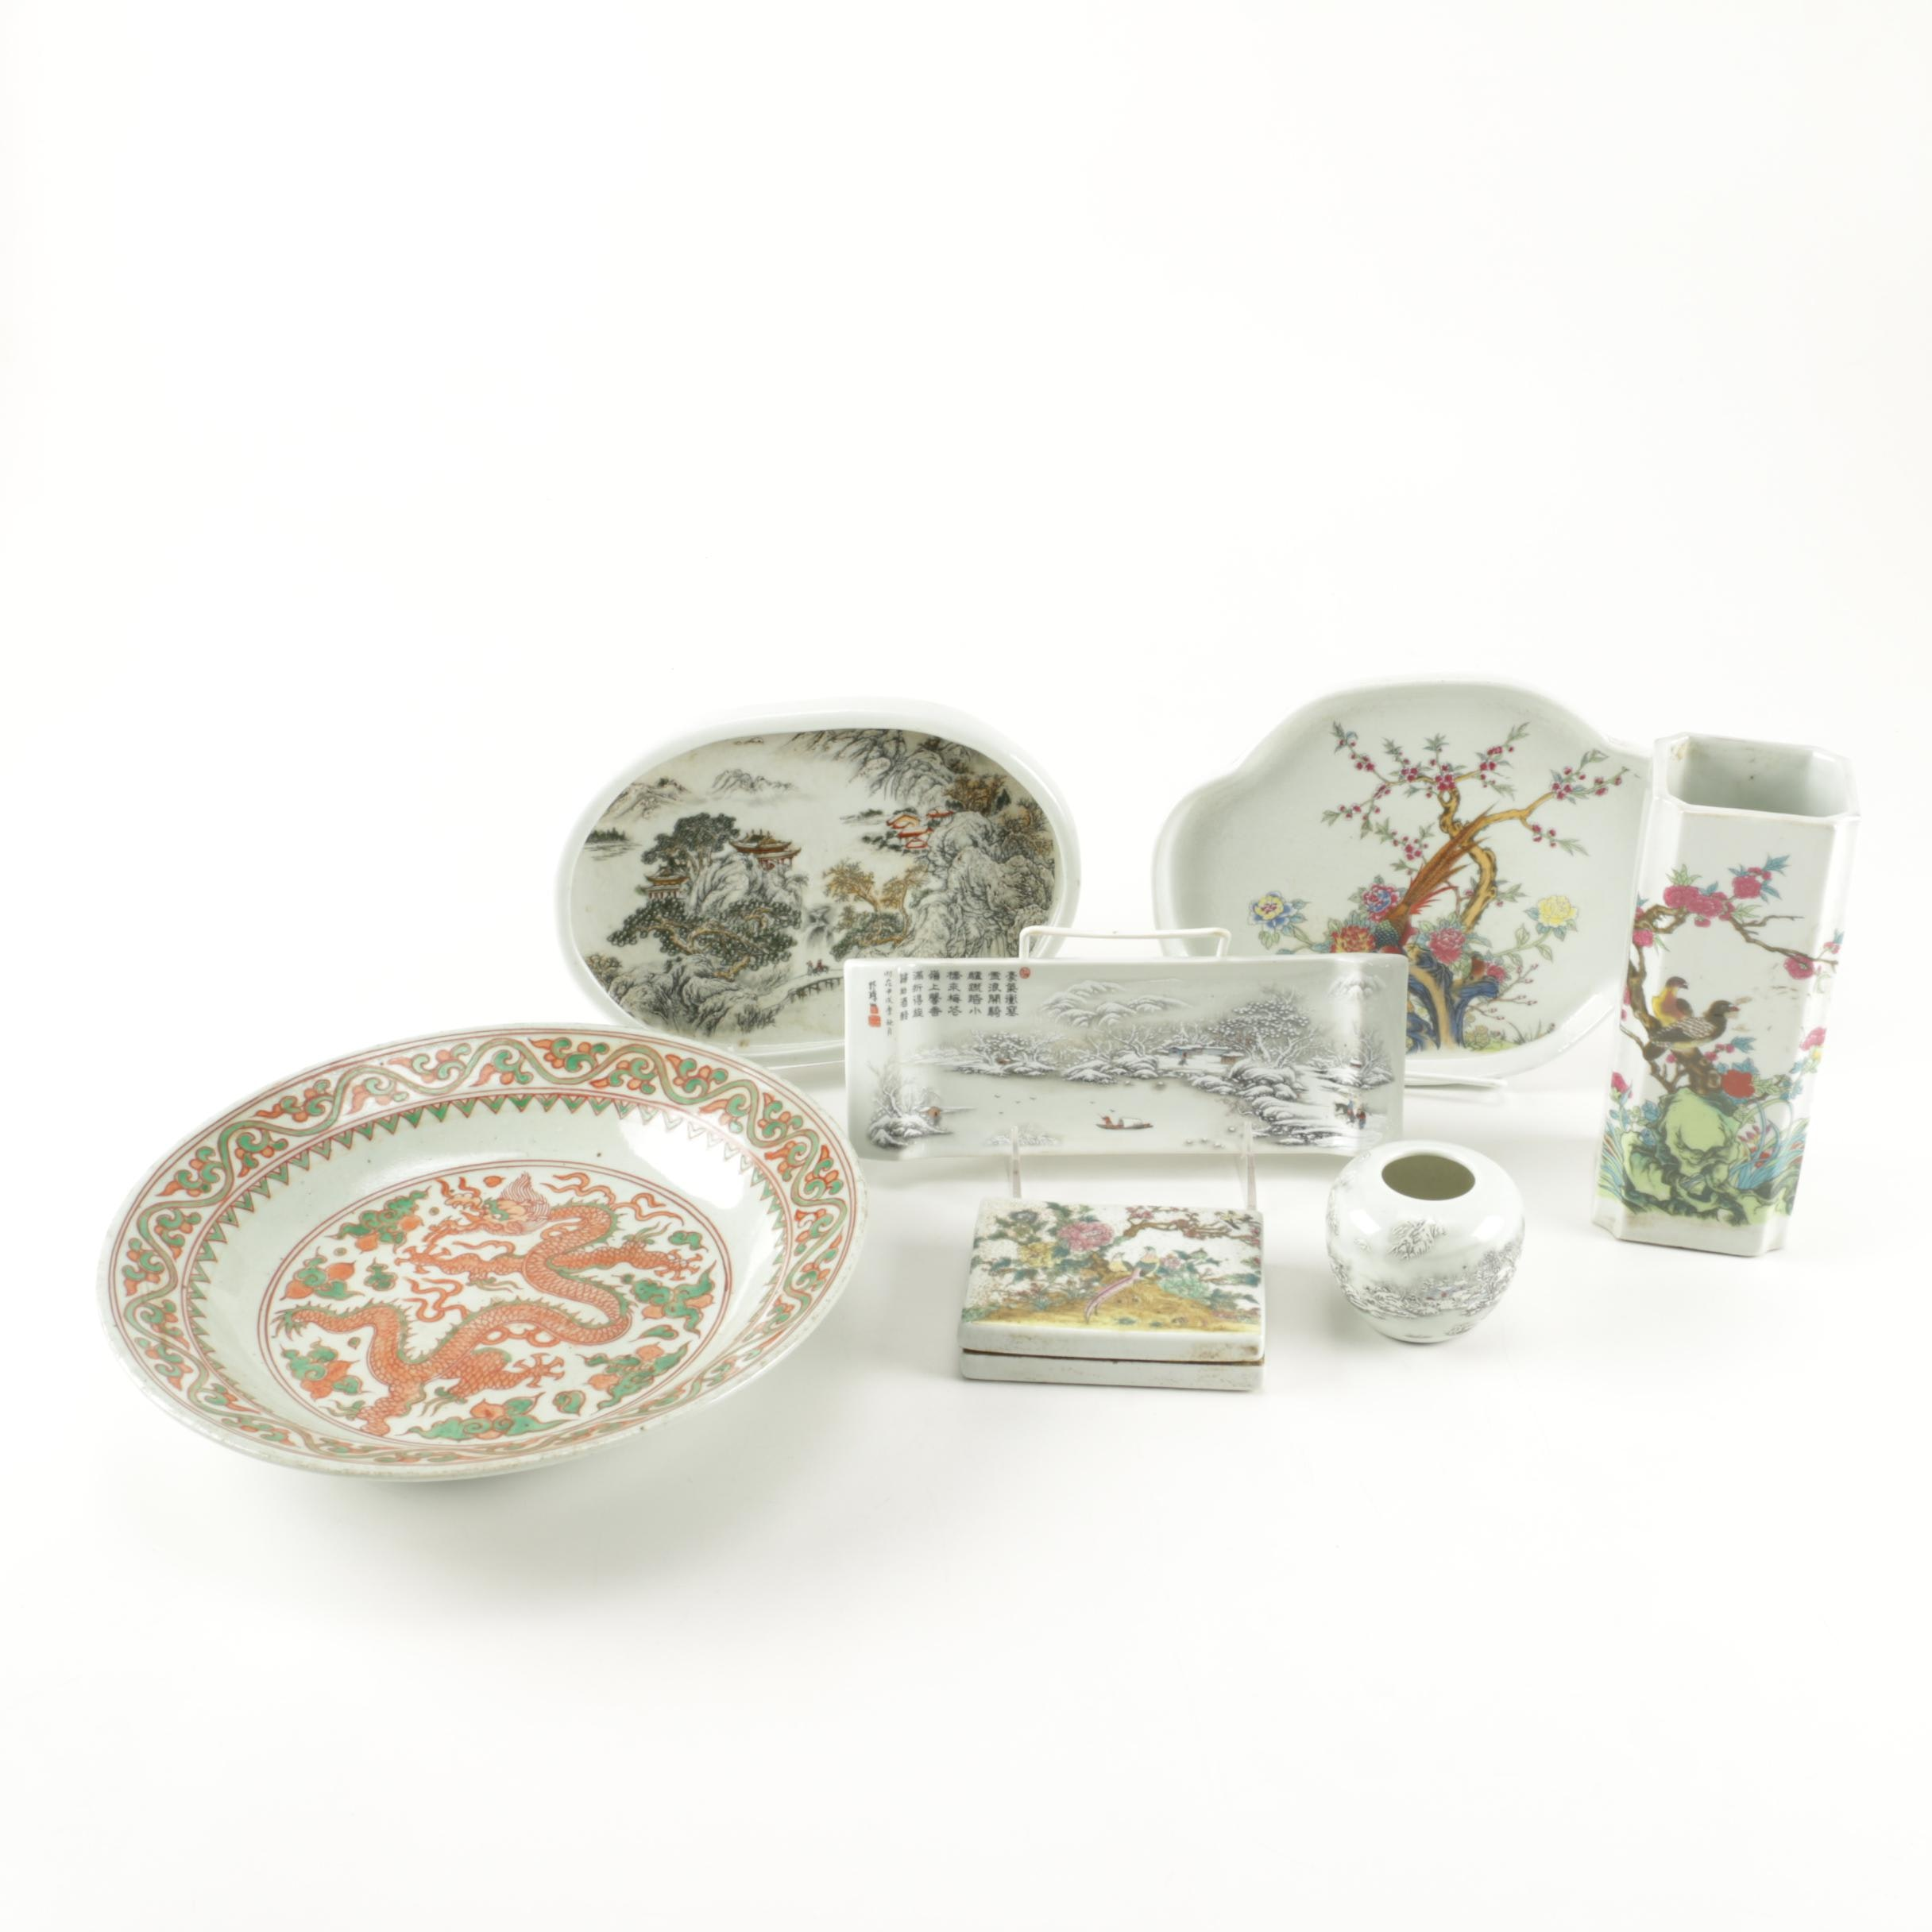 East Asian Ceramic Tableware Assortment